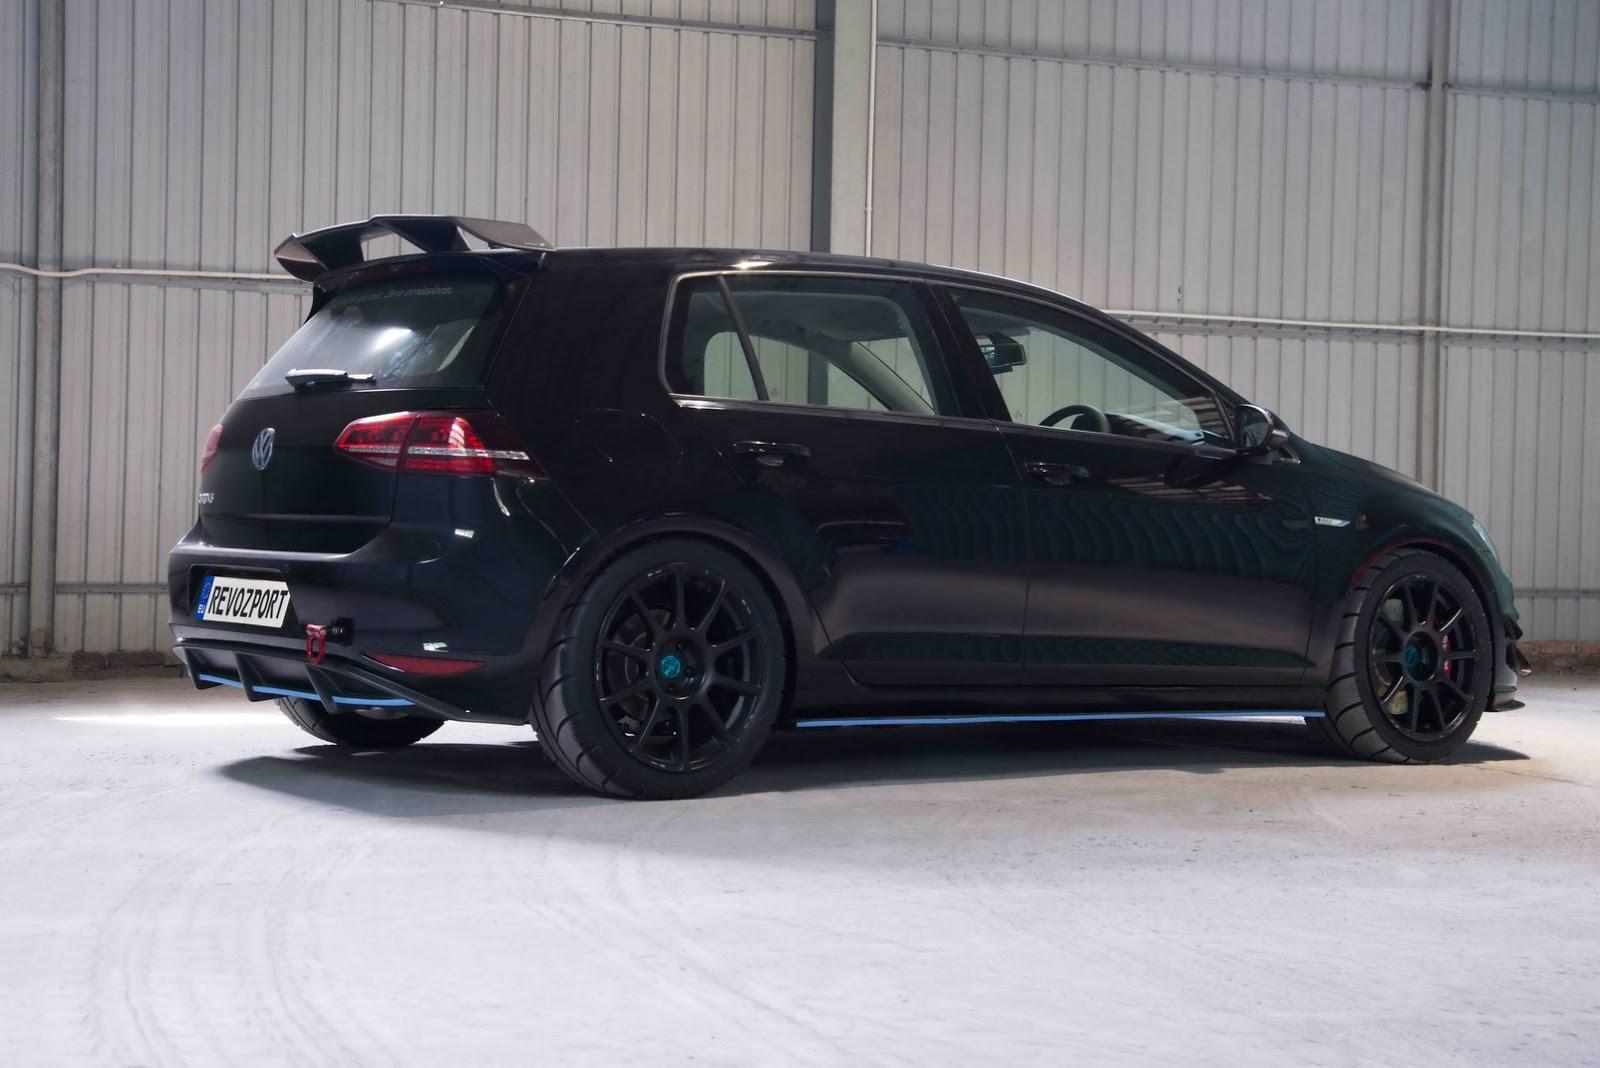 Volkswagen_e-Golf_Razor_7E_by_RevoZport_24